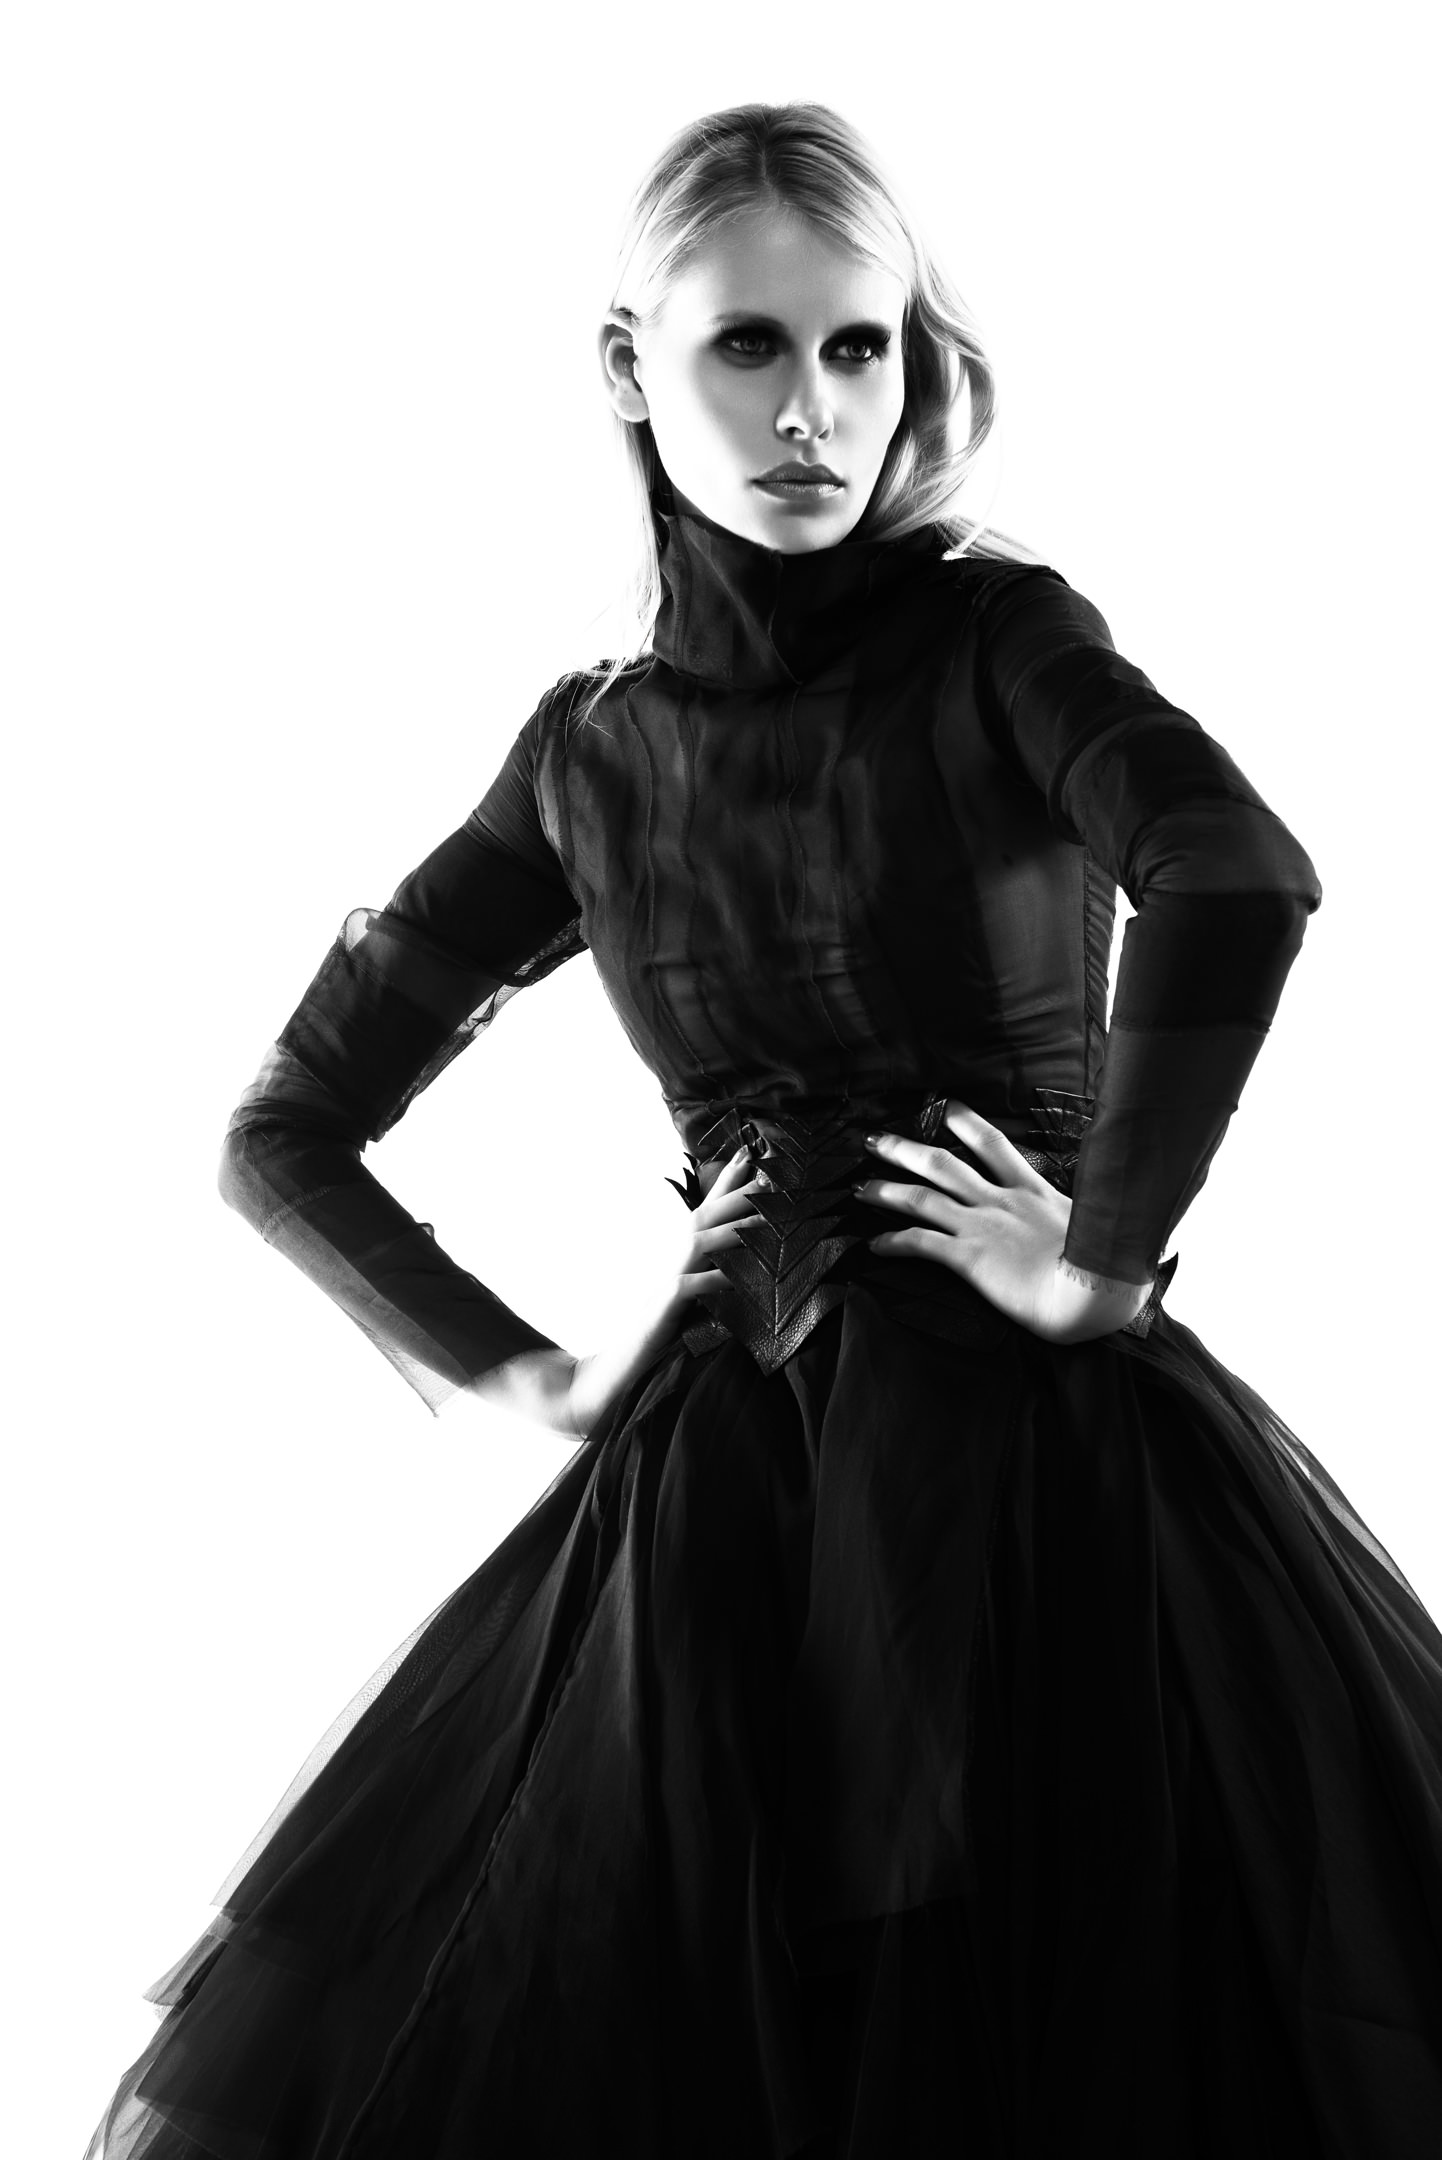 Maleficent-by-ANNA-BAZHANOVA-dh-20